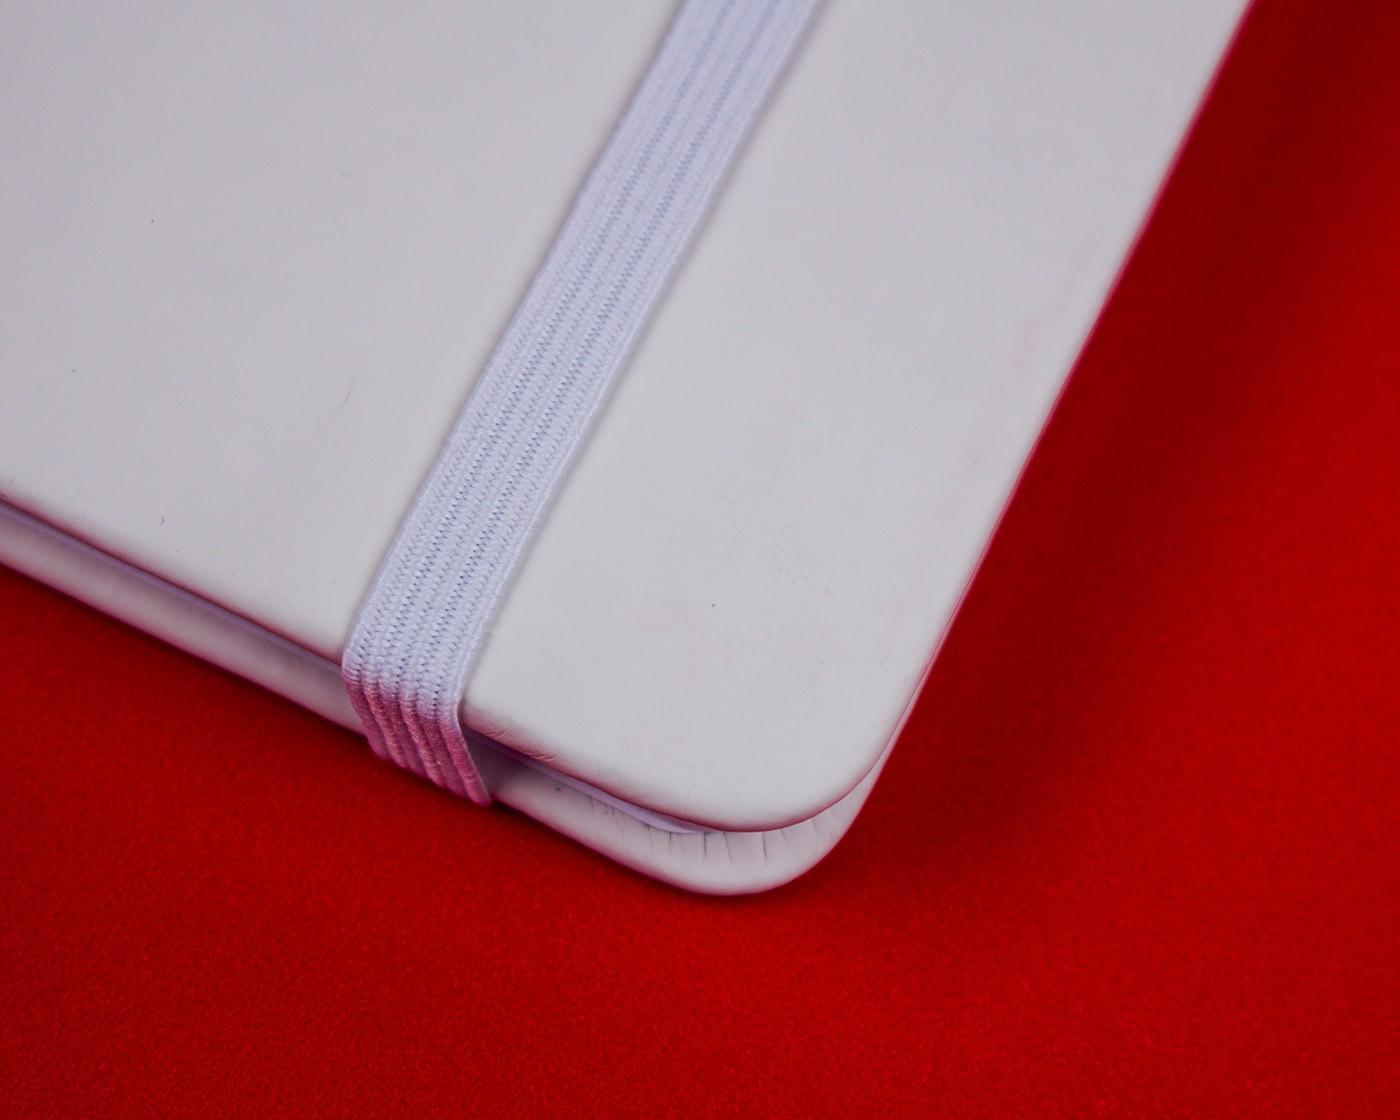 Notebook-Close-Up-Quality